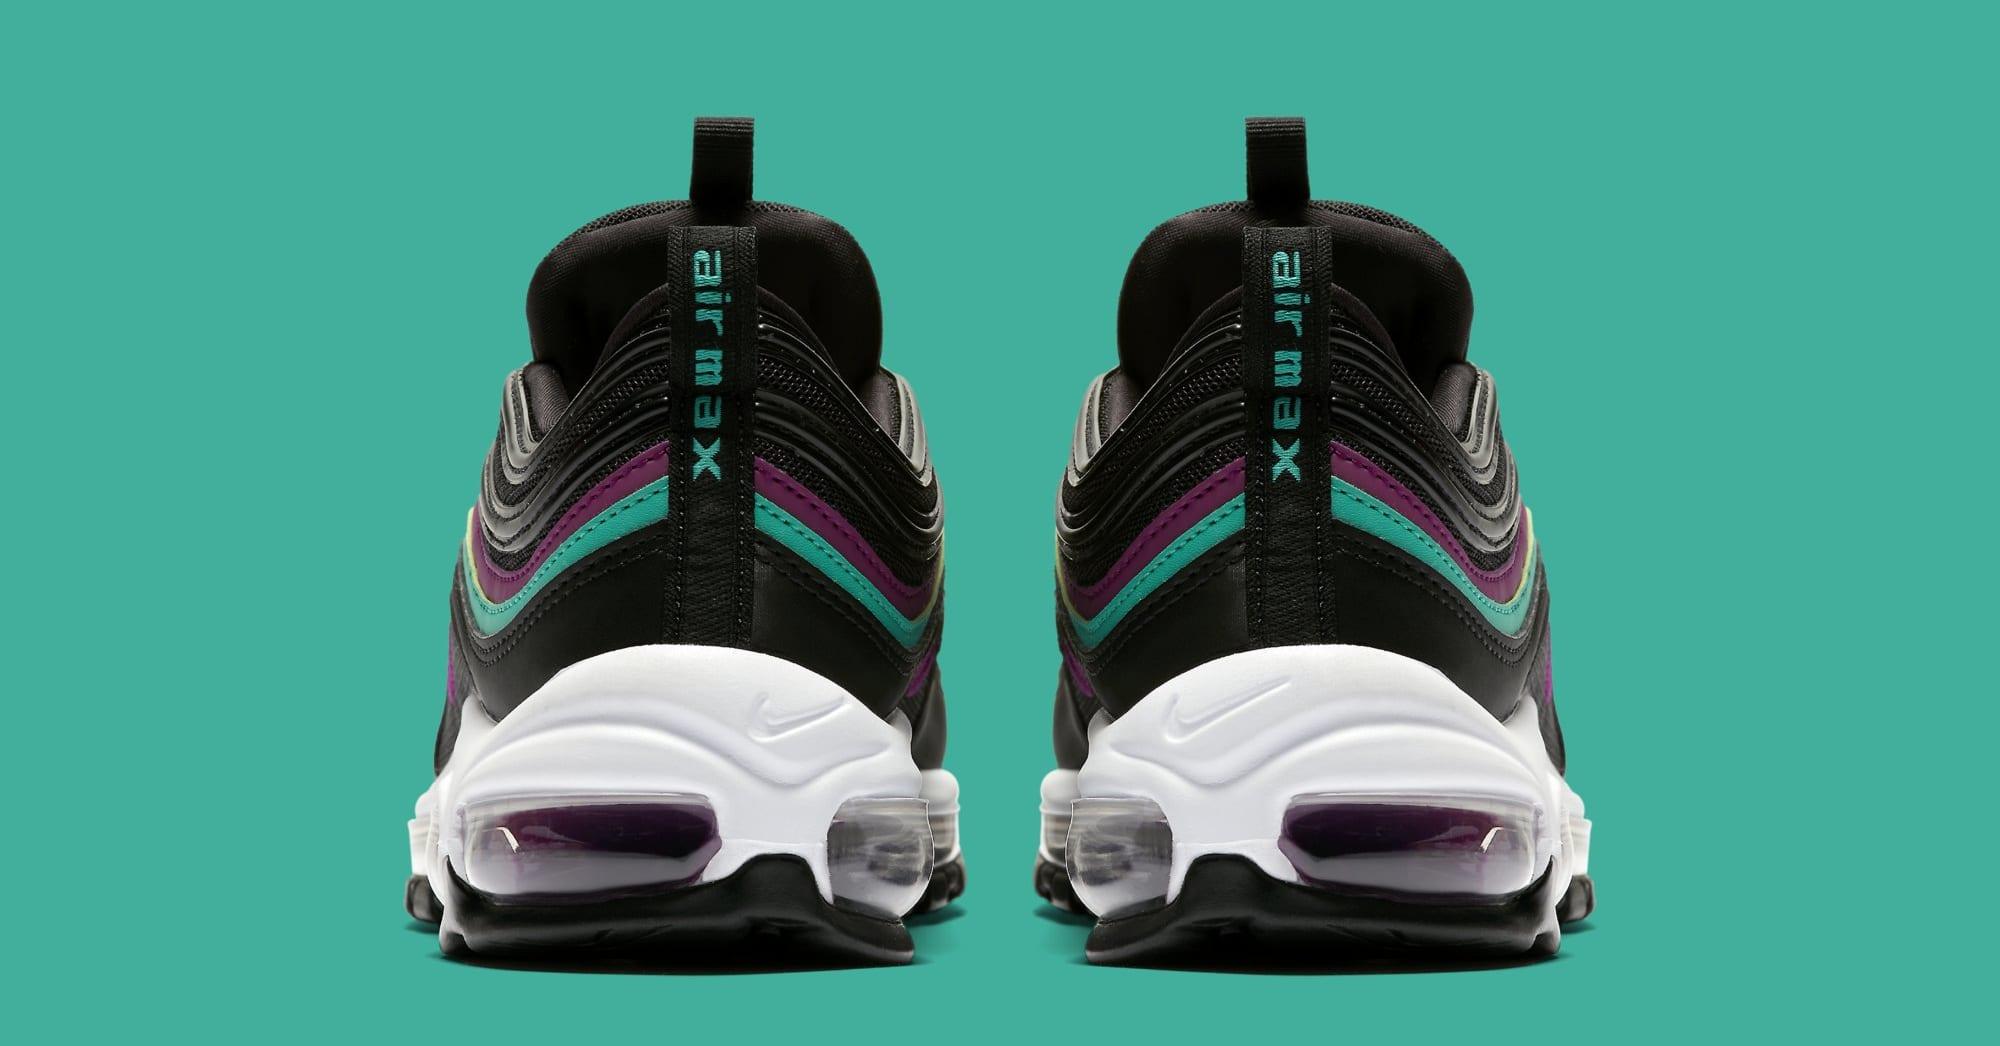 Nike Air Max 97 WMNS 'Black/Bright Grape/Clear Emerald' 921733-008 (Heel)